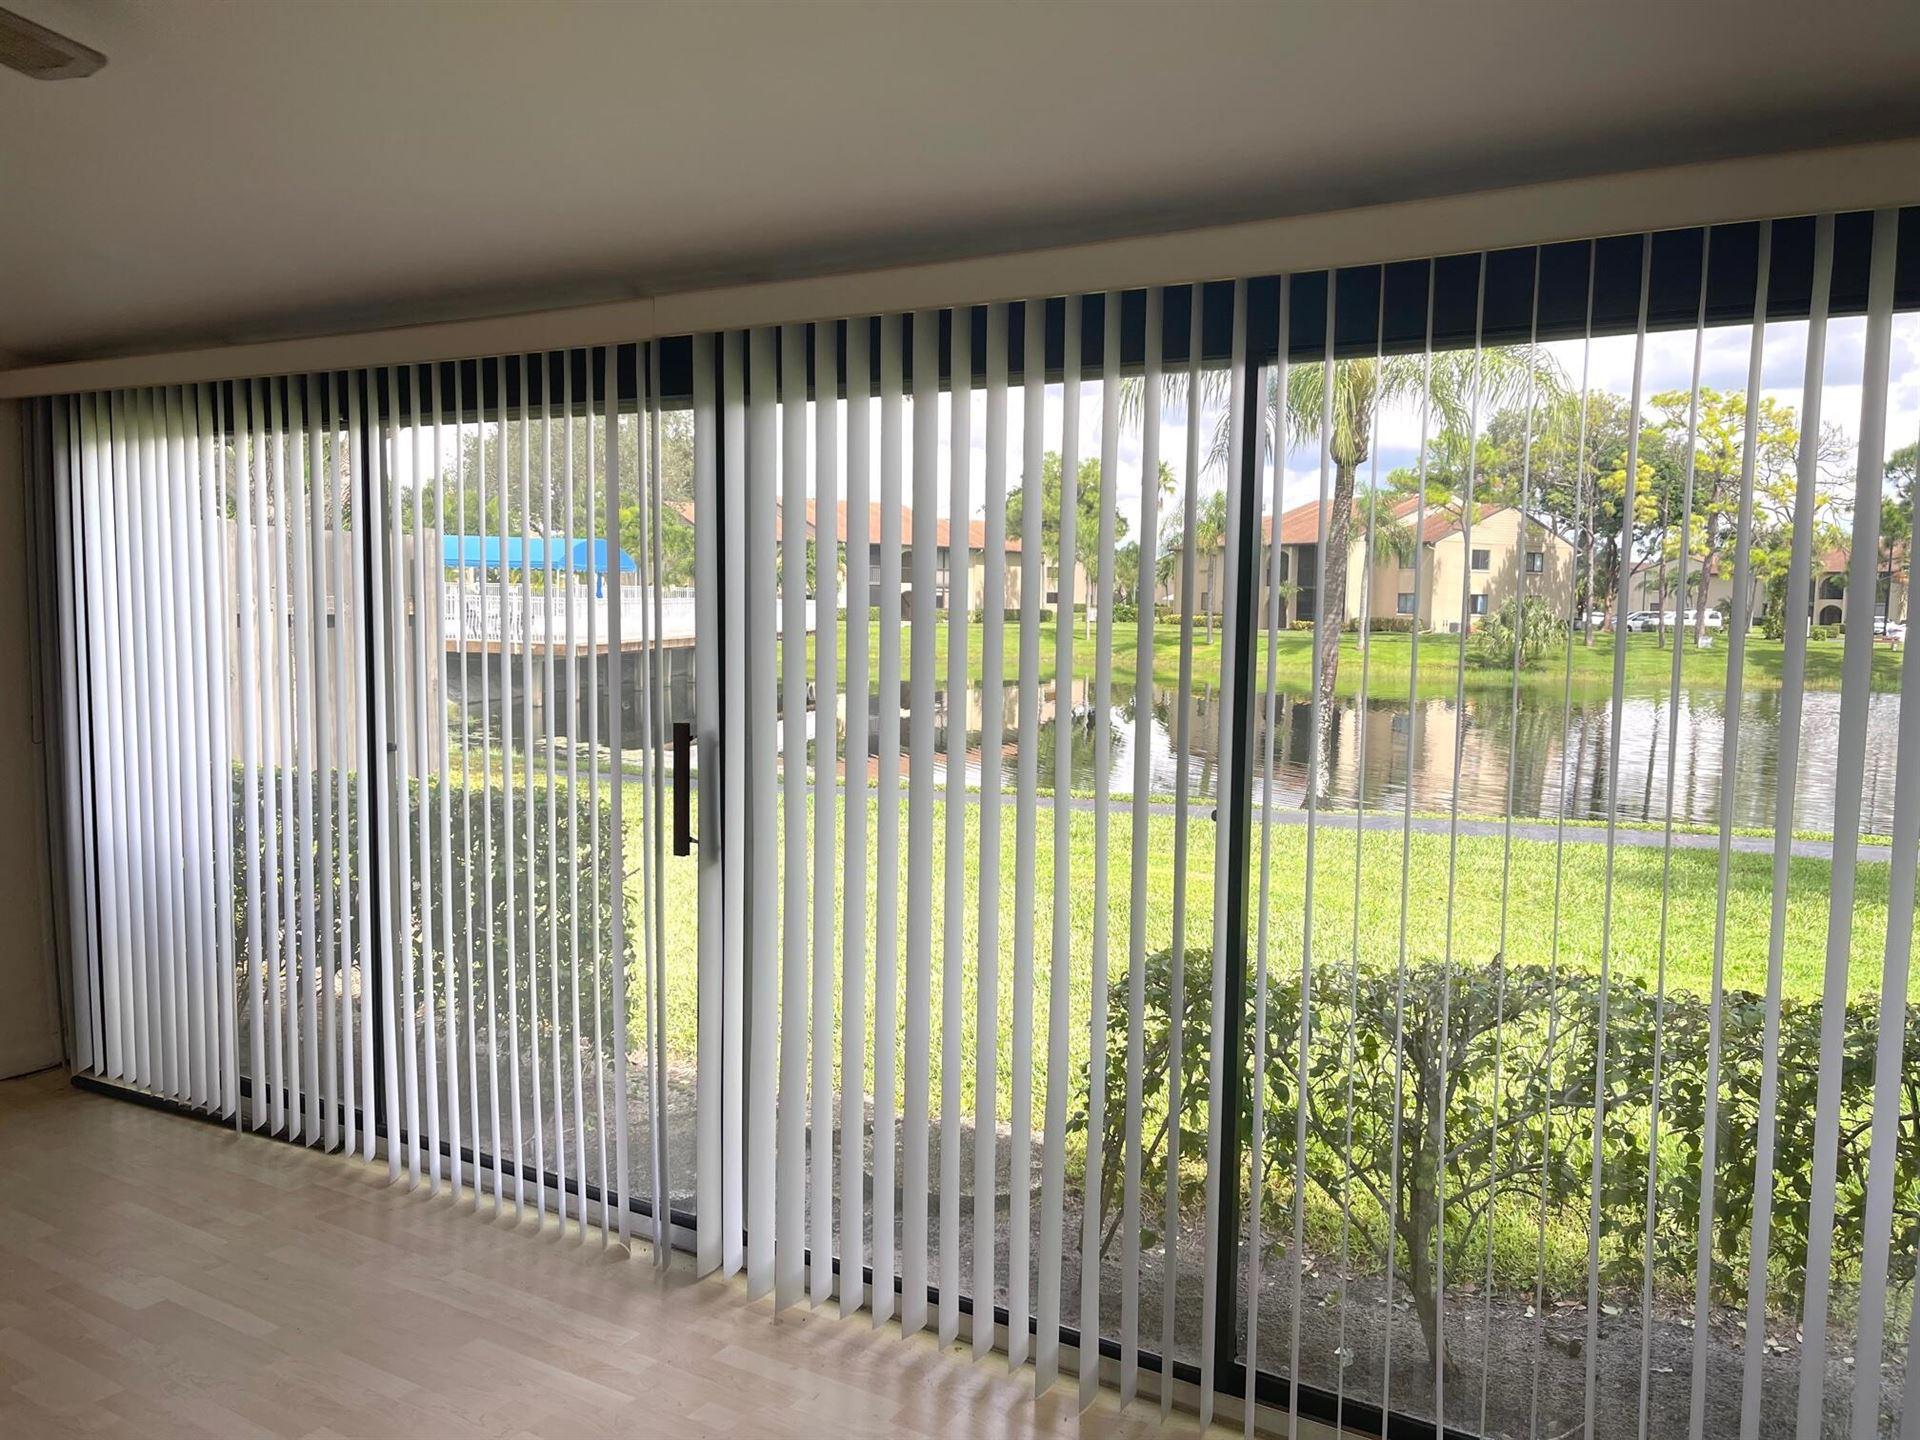 Photo of 541 Shady Pine Way #H, Greenacres, FL 33415 (MLS # RX-10747934)